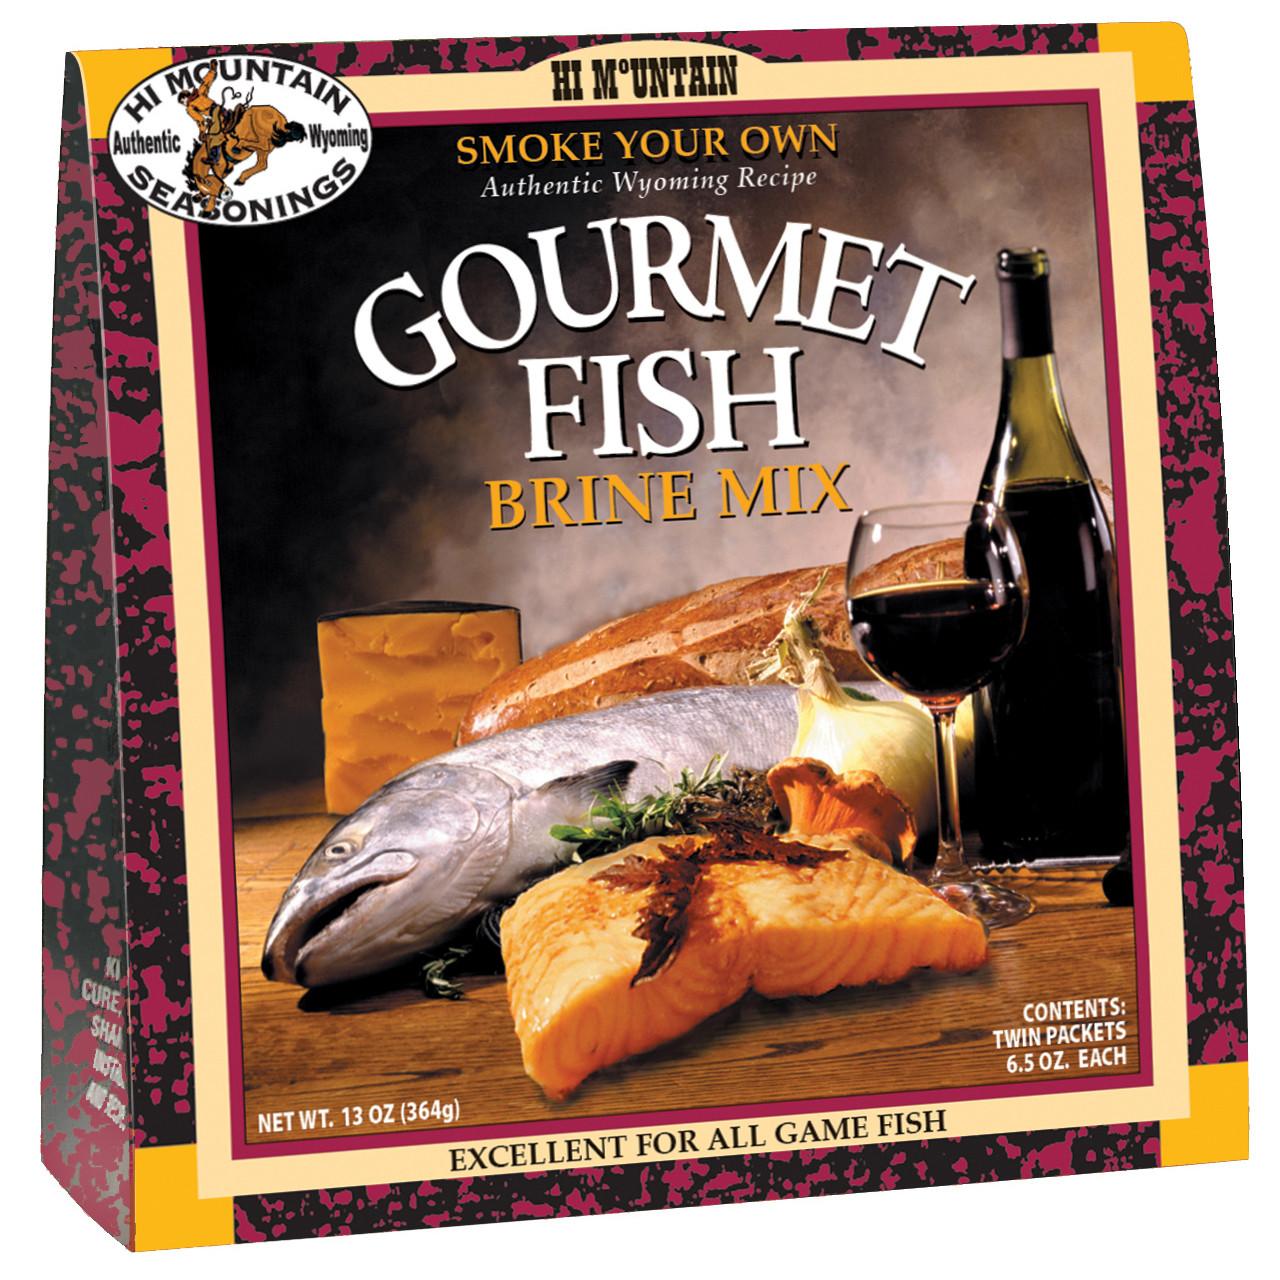 Gourmet Fish Brine Mix